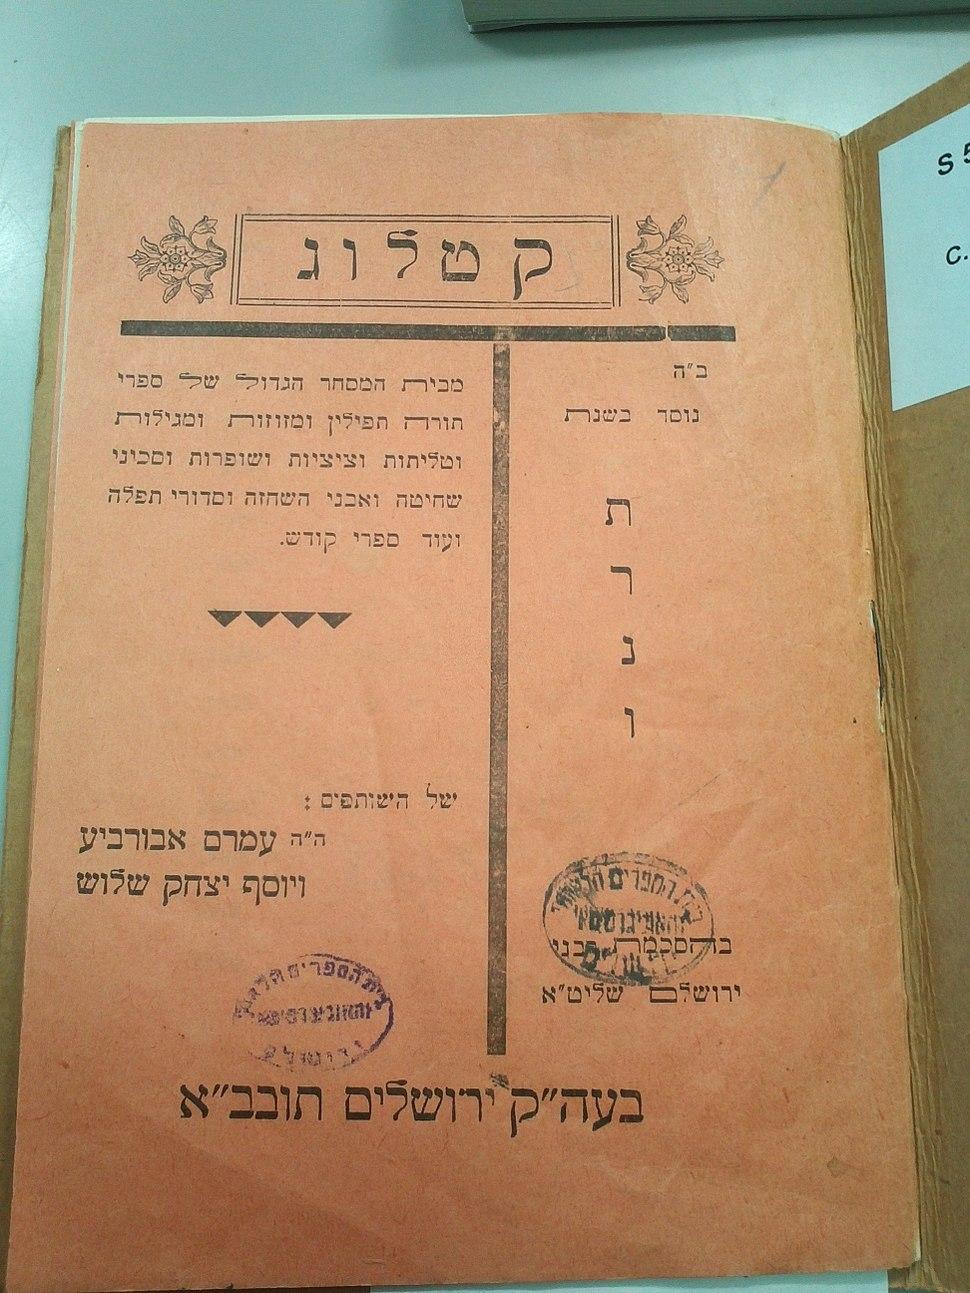 Amram Aburbeh catalog of Judaica store Beit Mischar leTashmishei Kedusha, Jerusalem